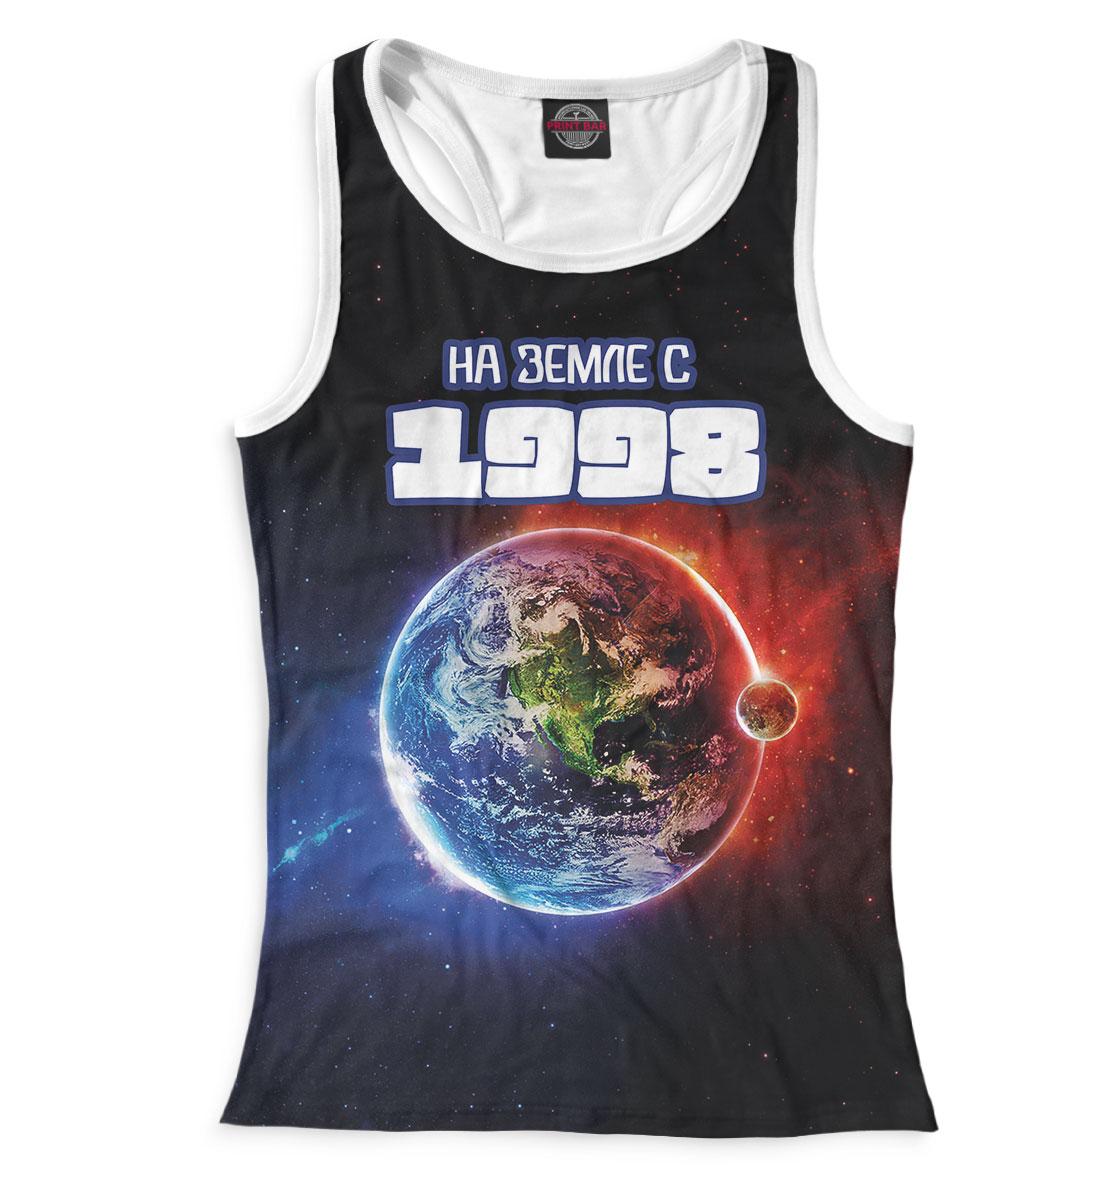 Купить На Земле с 1998, Printbar, Майки борцовки, DDM-580429-mayb-1